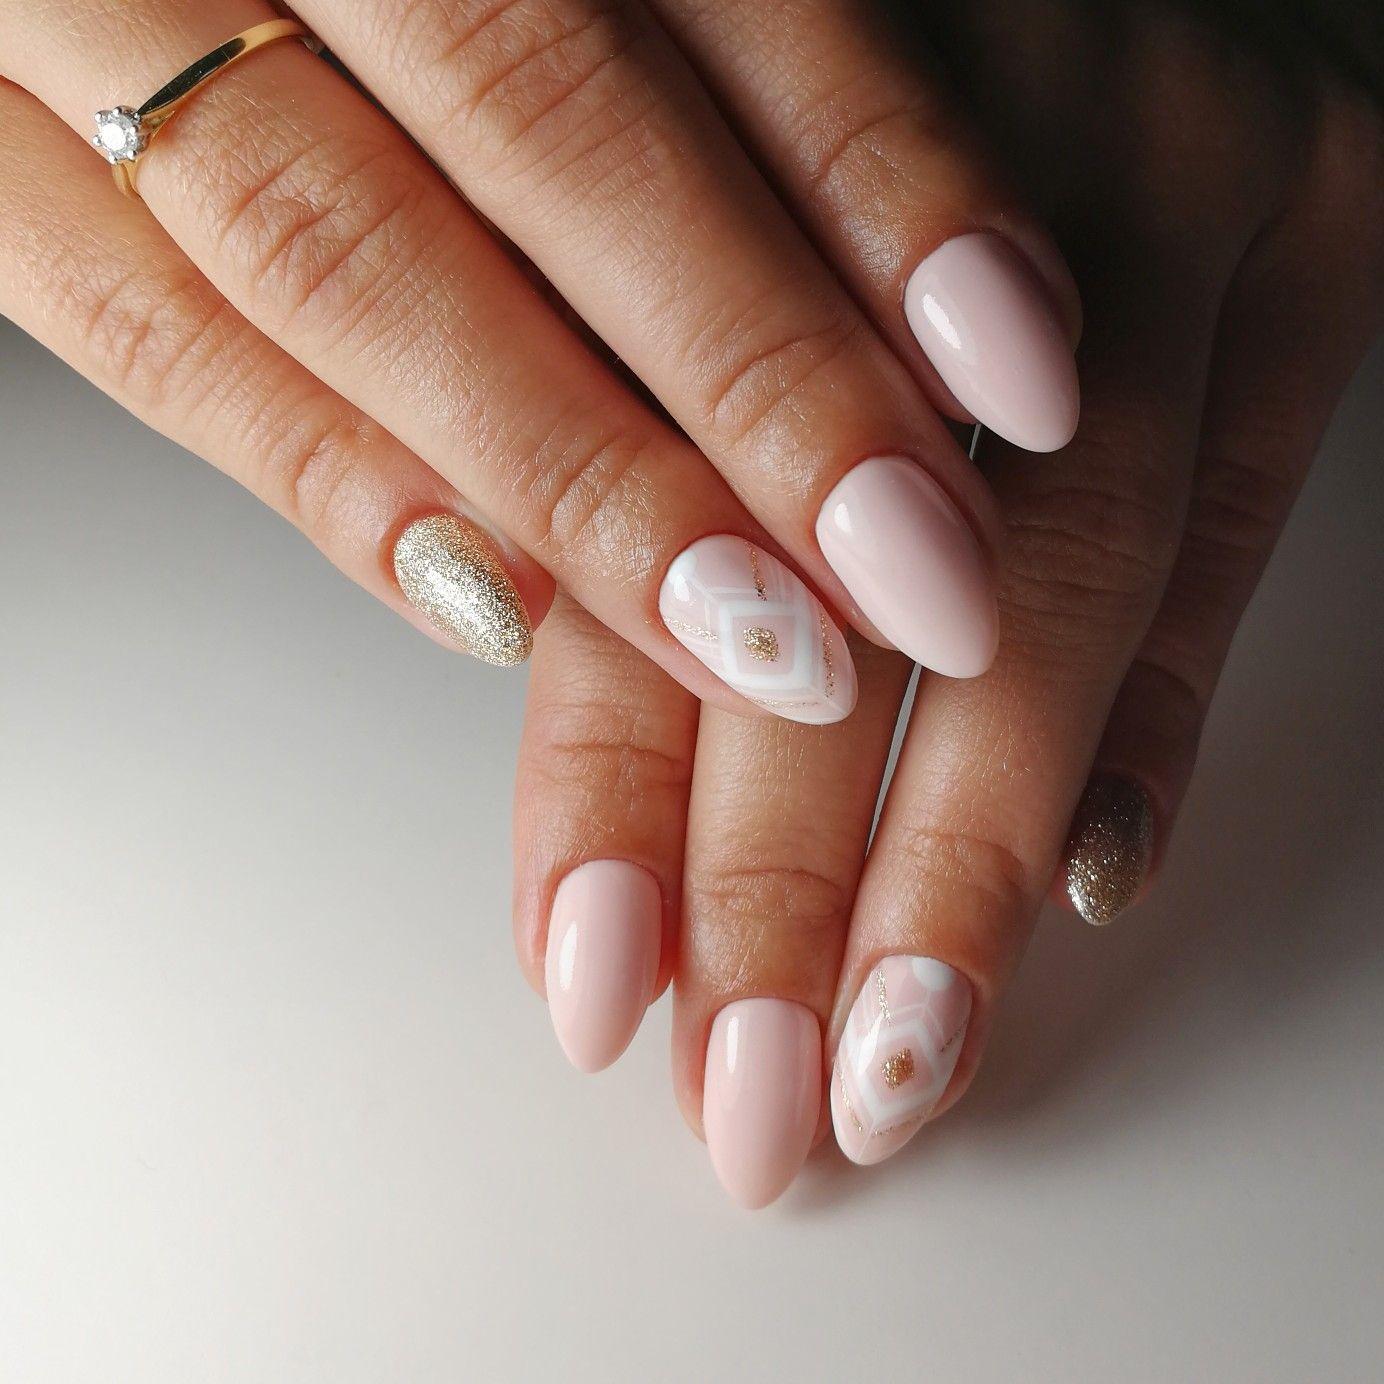 Nails Paznokcie Hybryda Hybrydy Semilac Mani Manicure Nails